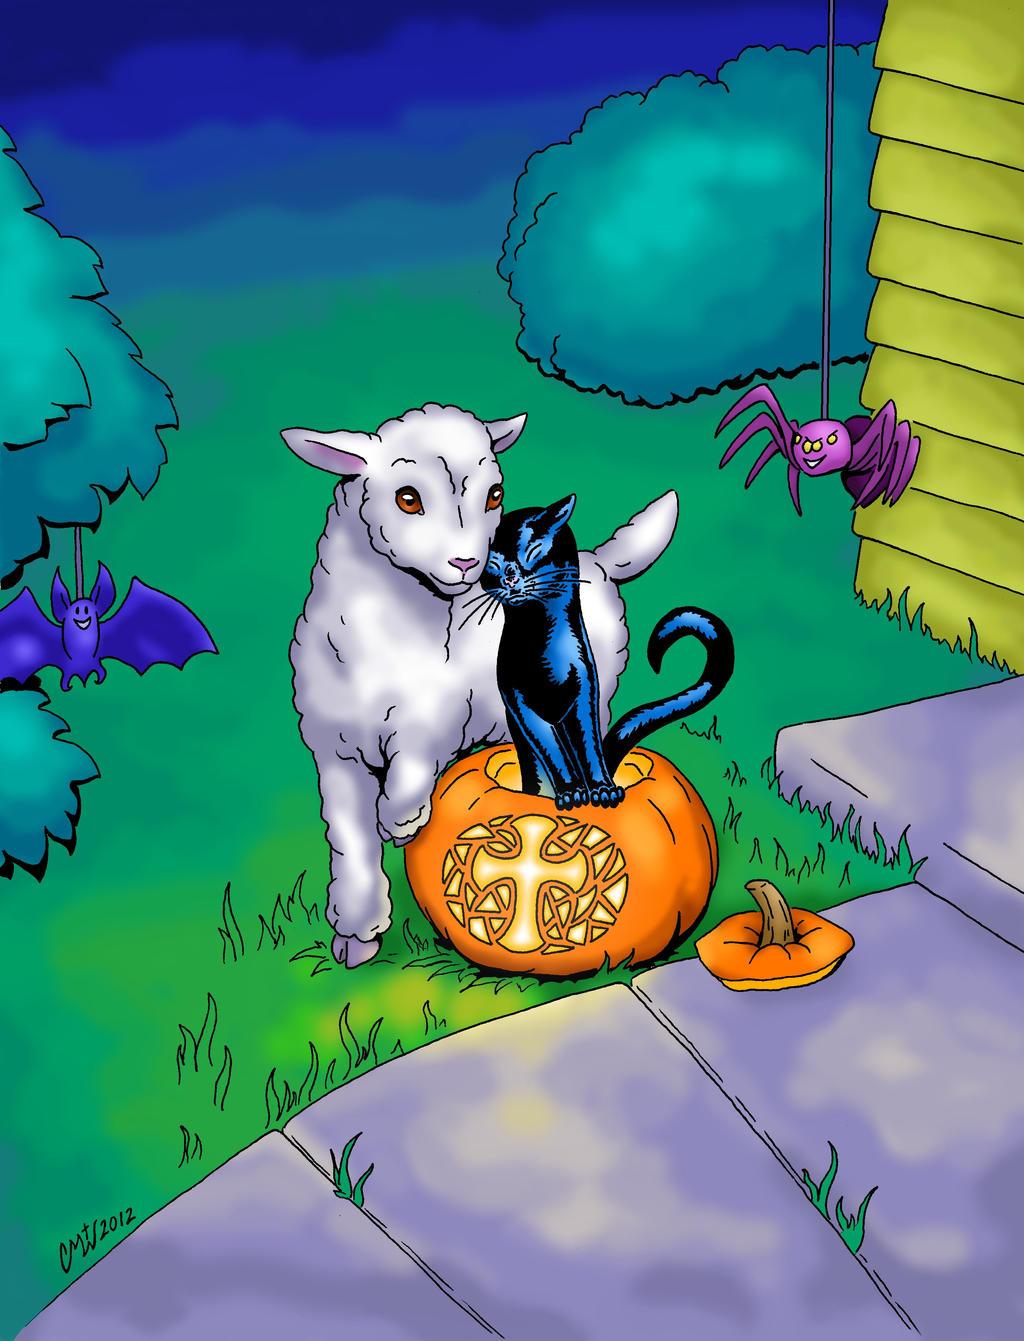 Christian Halloween (meme template) by Virtuous-Creature on DeviantArt